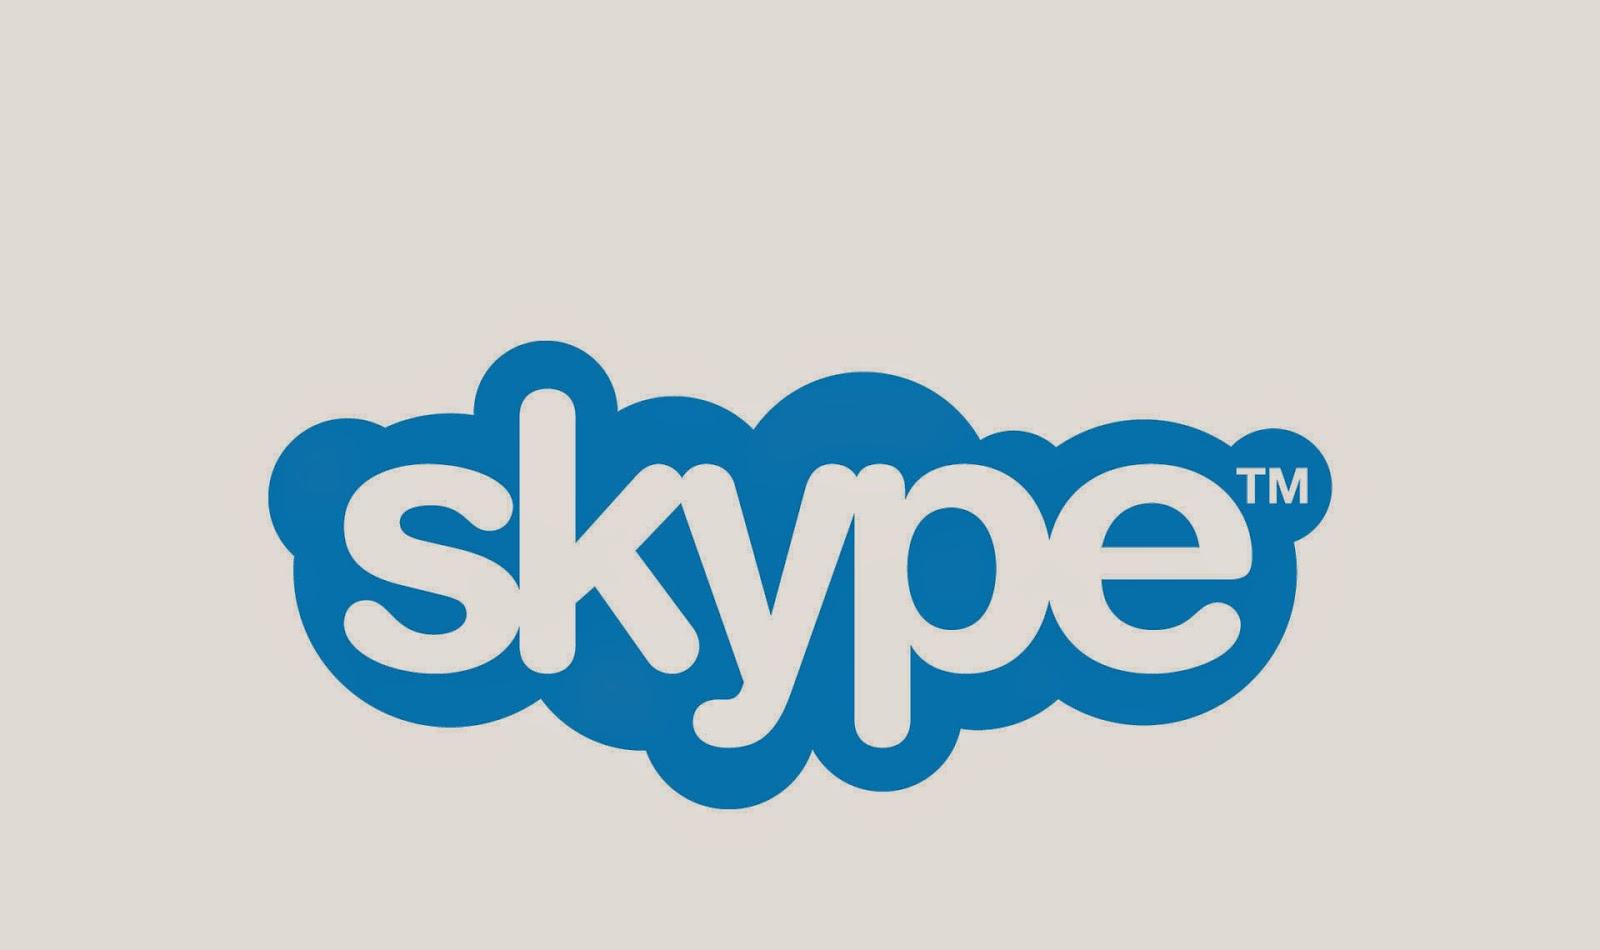 Skype free download Latest Version